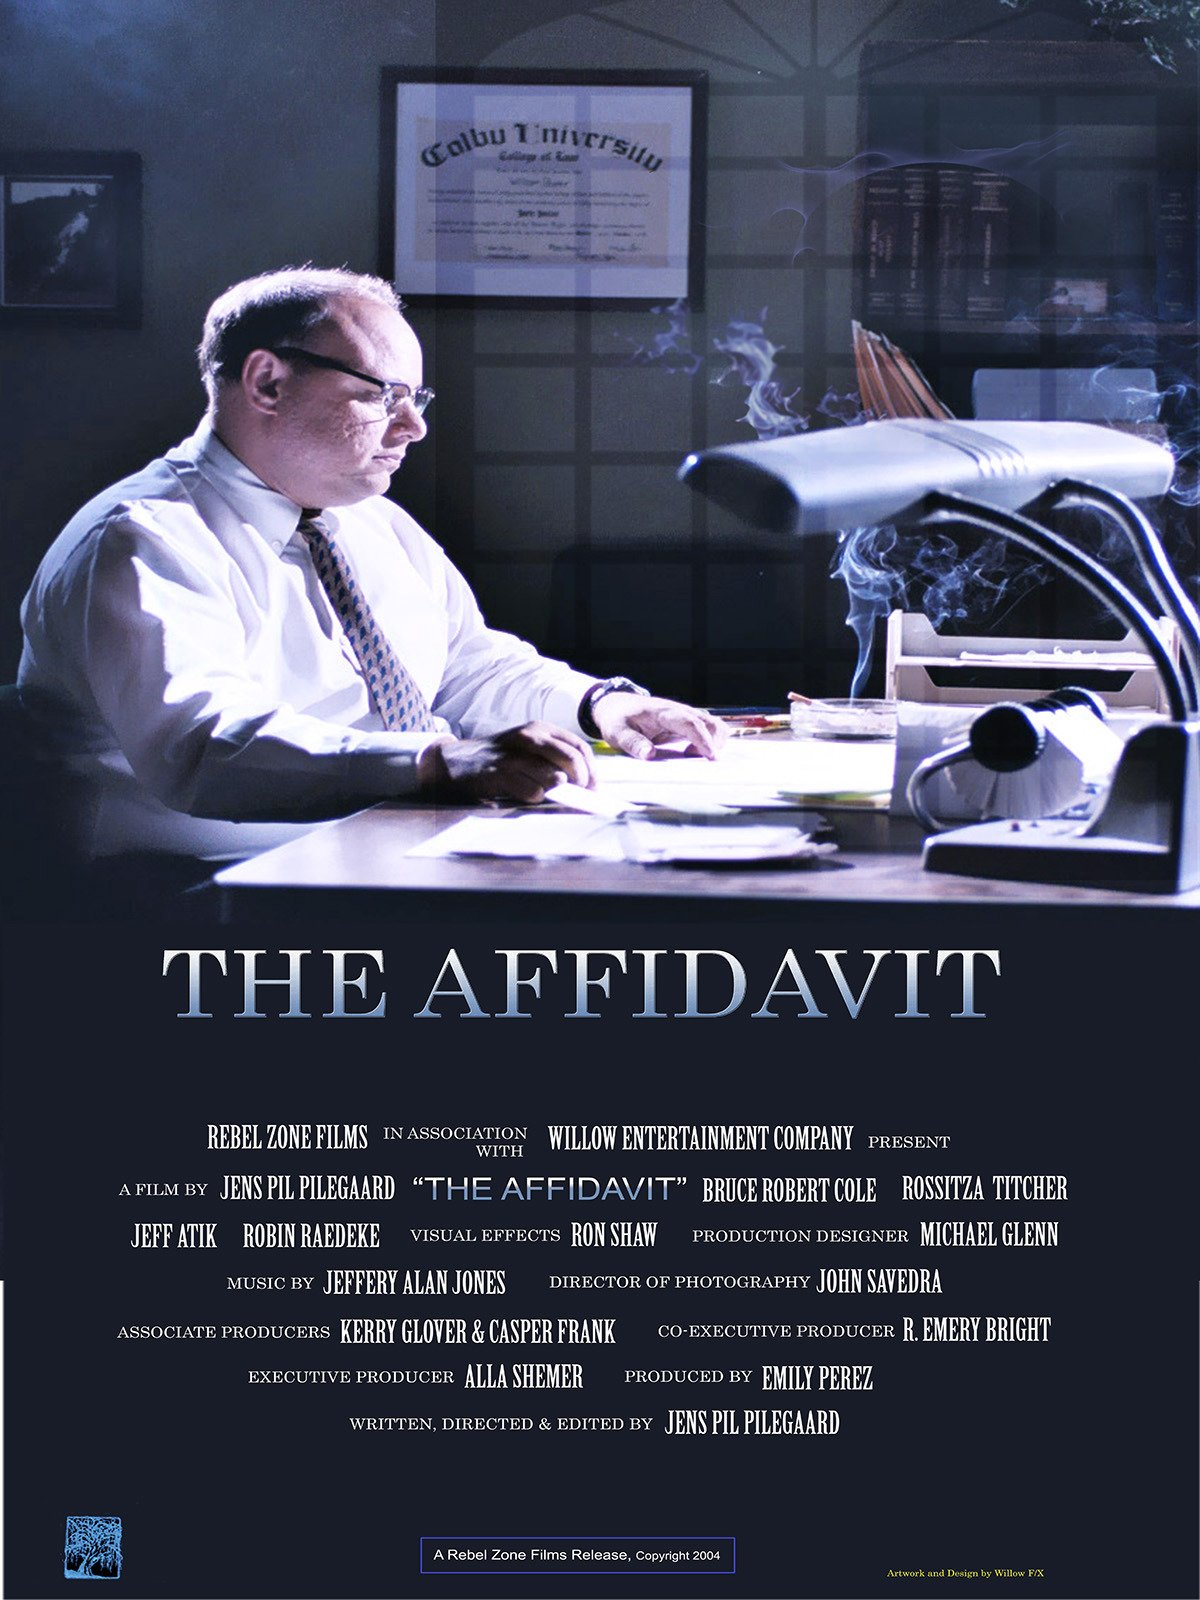 The Affidavit